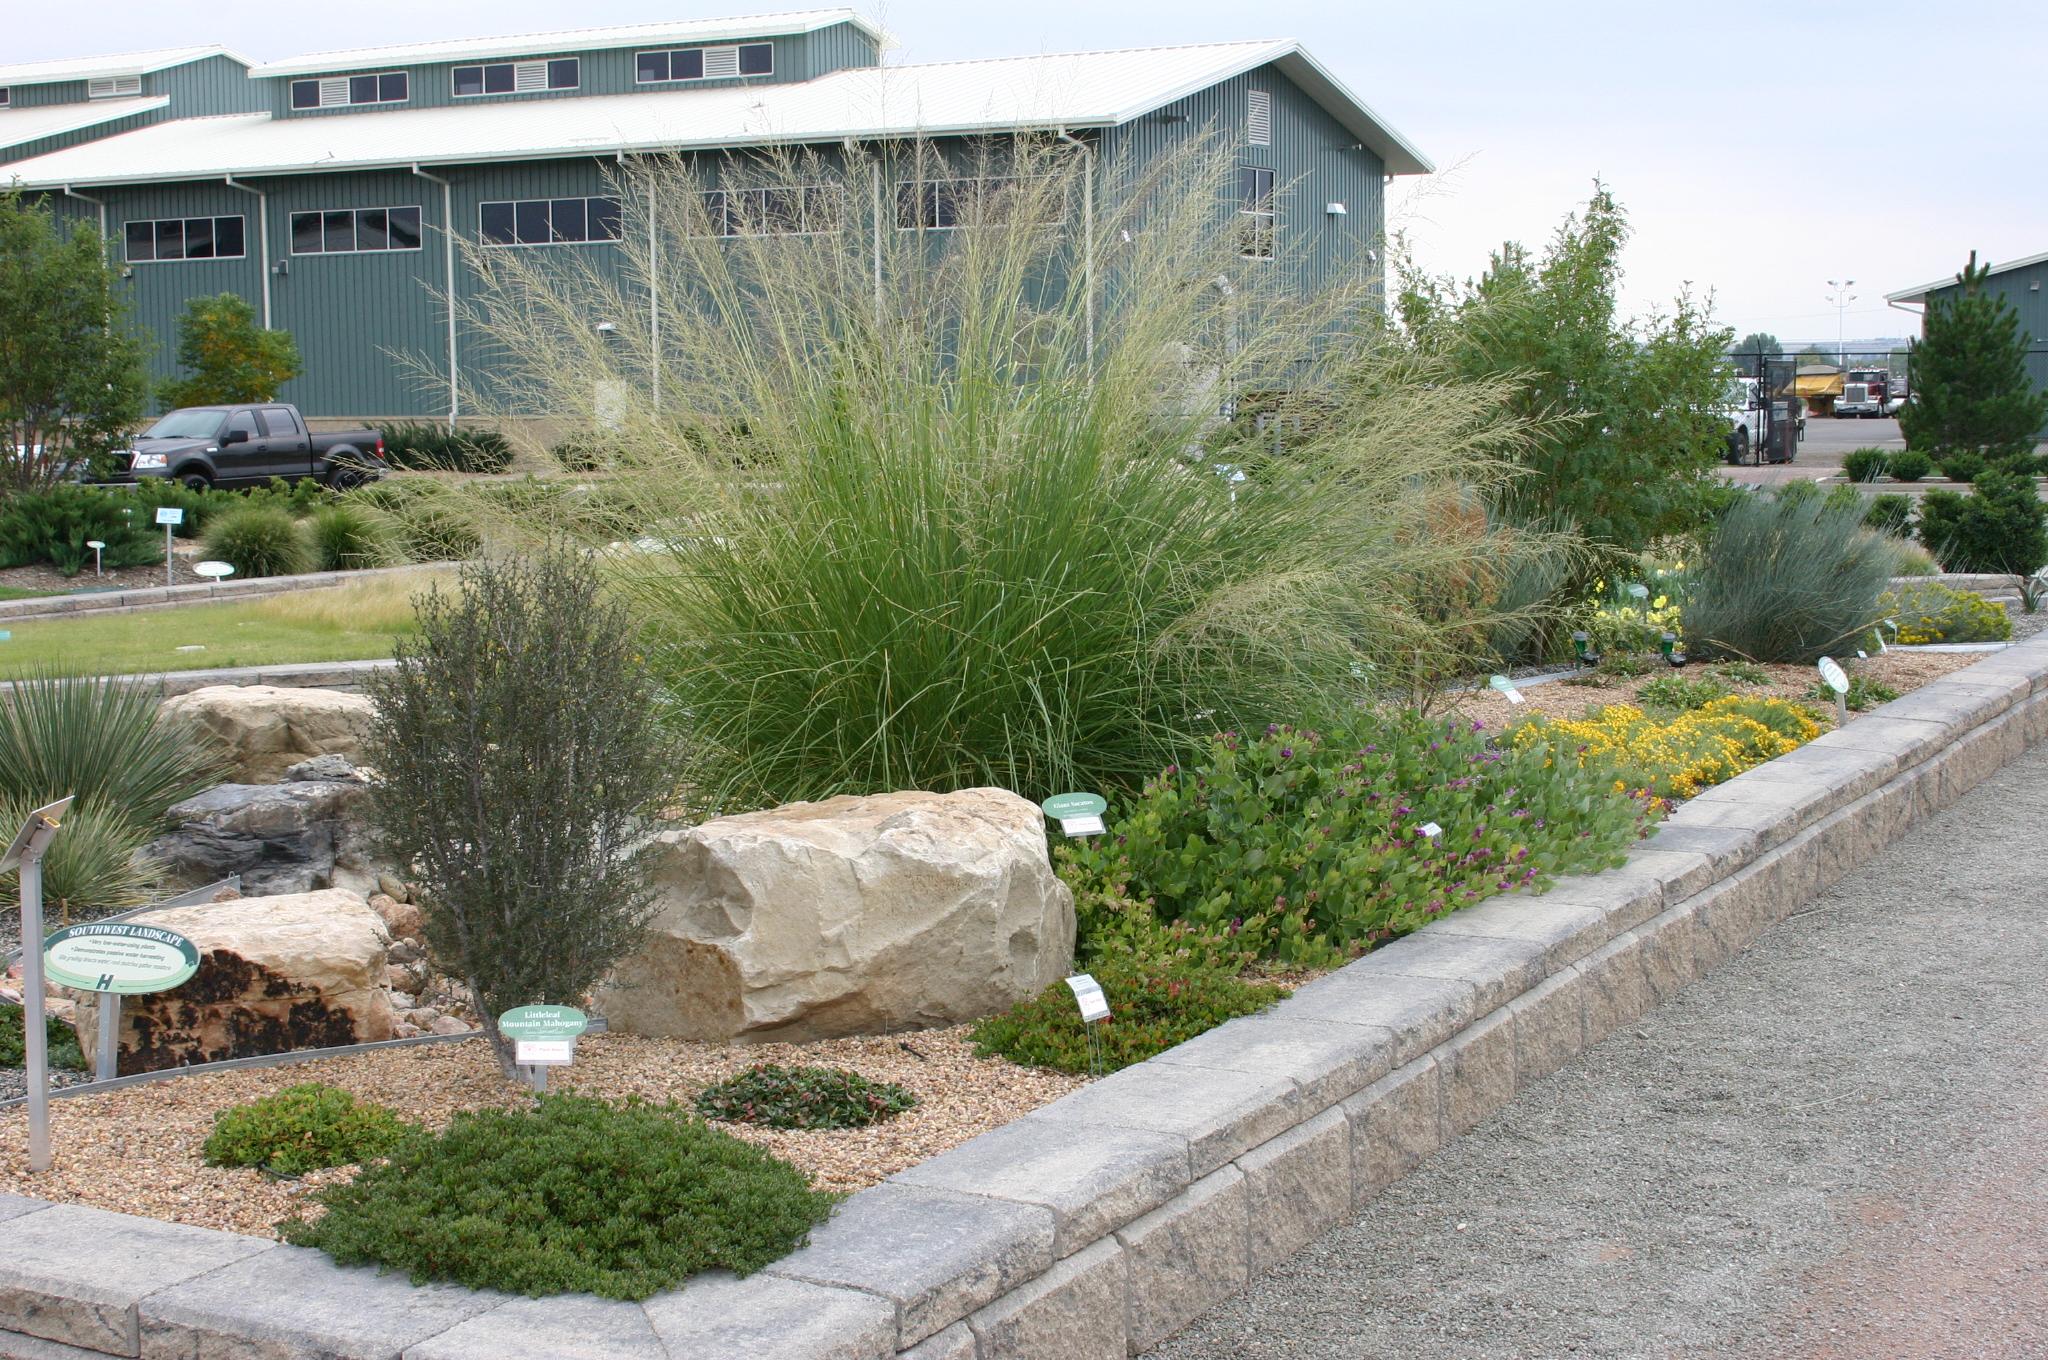 photos - Water Conservation Garden